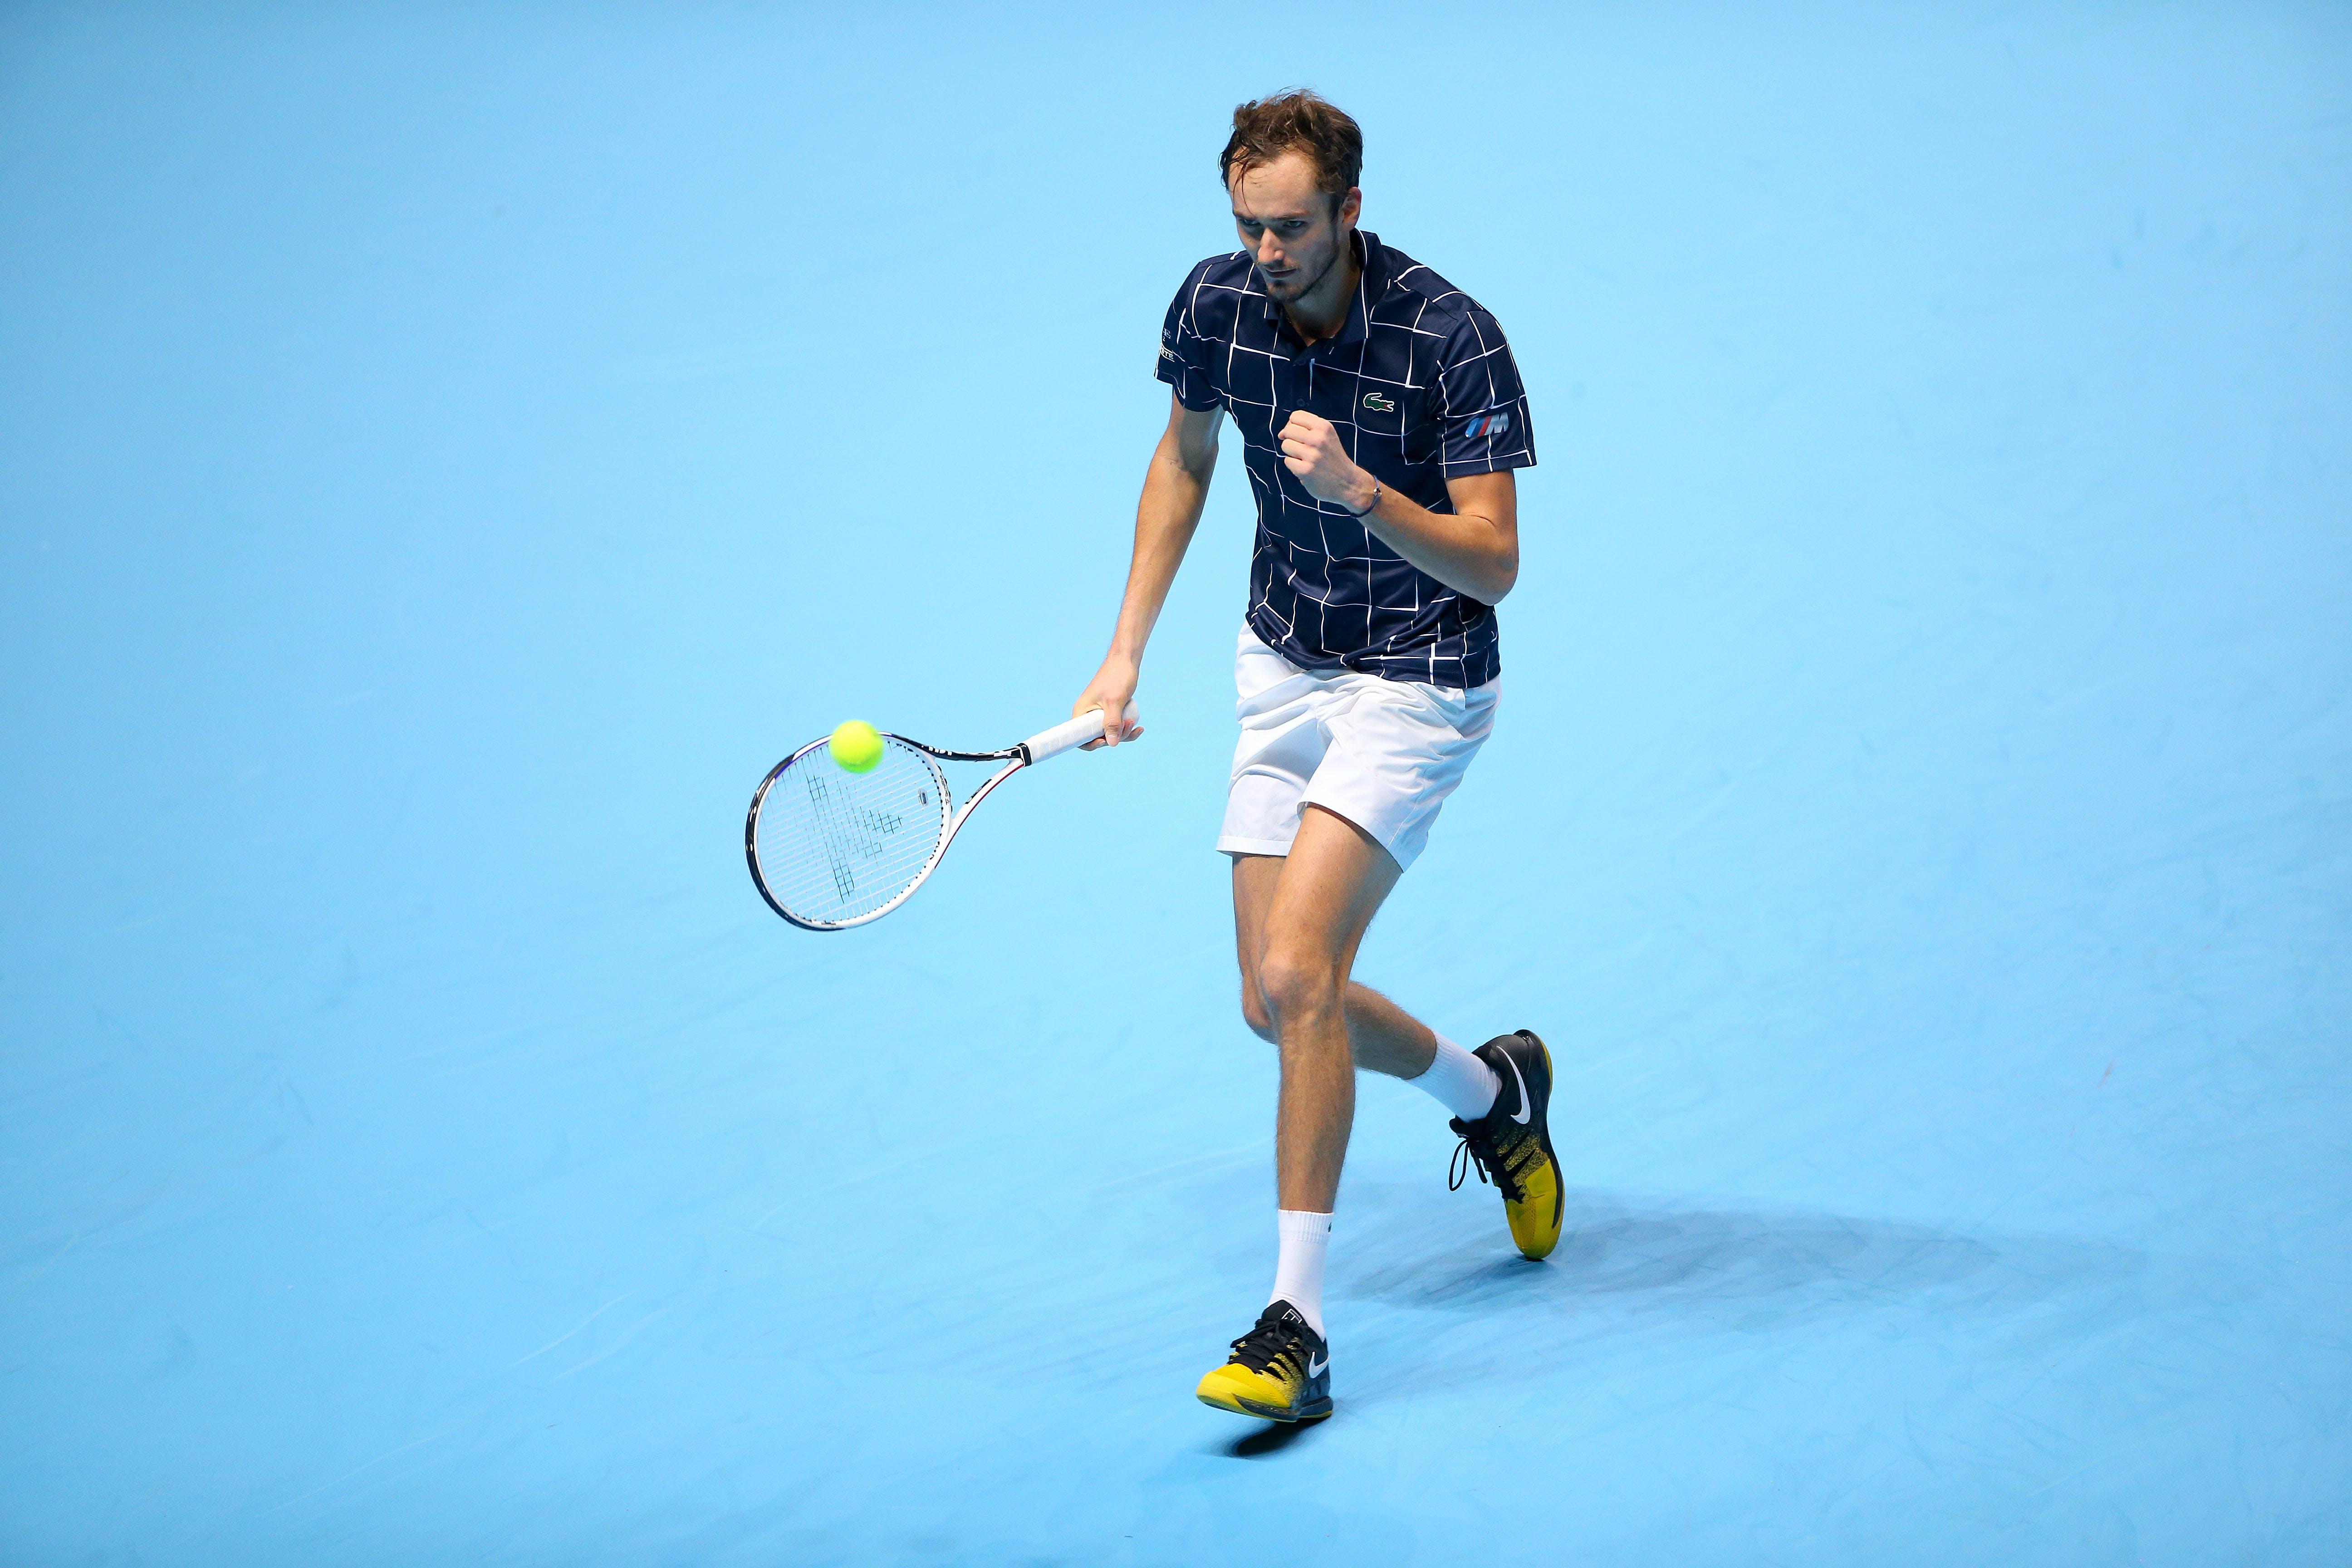 Daniil Medvedev celebrating during his round-robin match against Novak Djokovic at the ATP Finals 2020